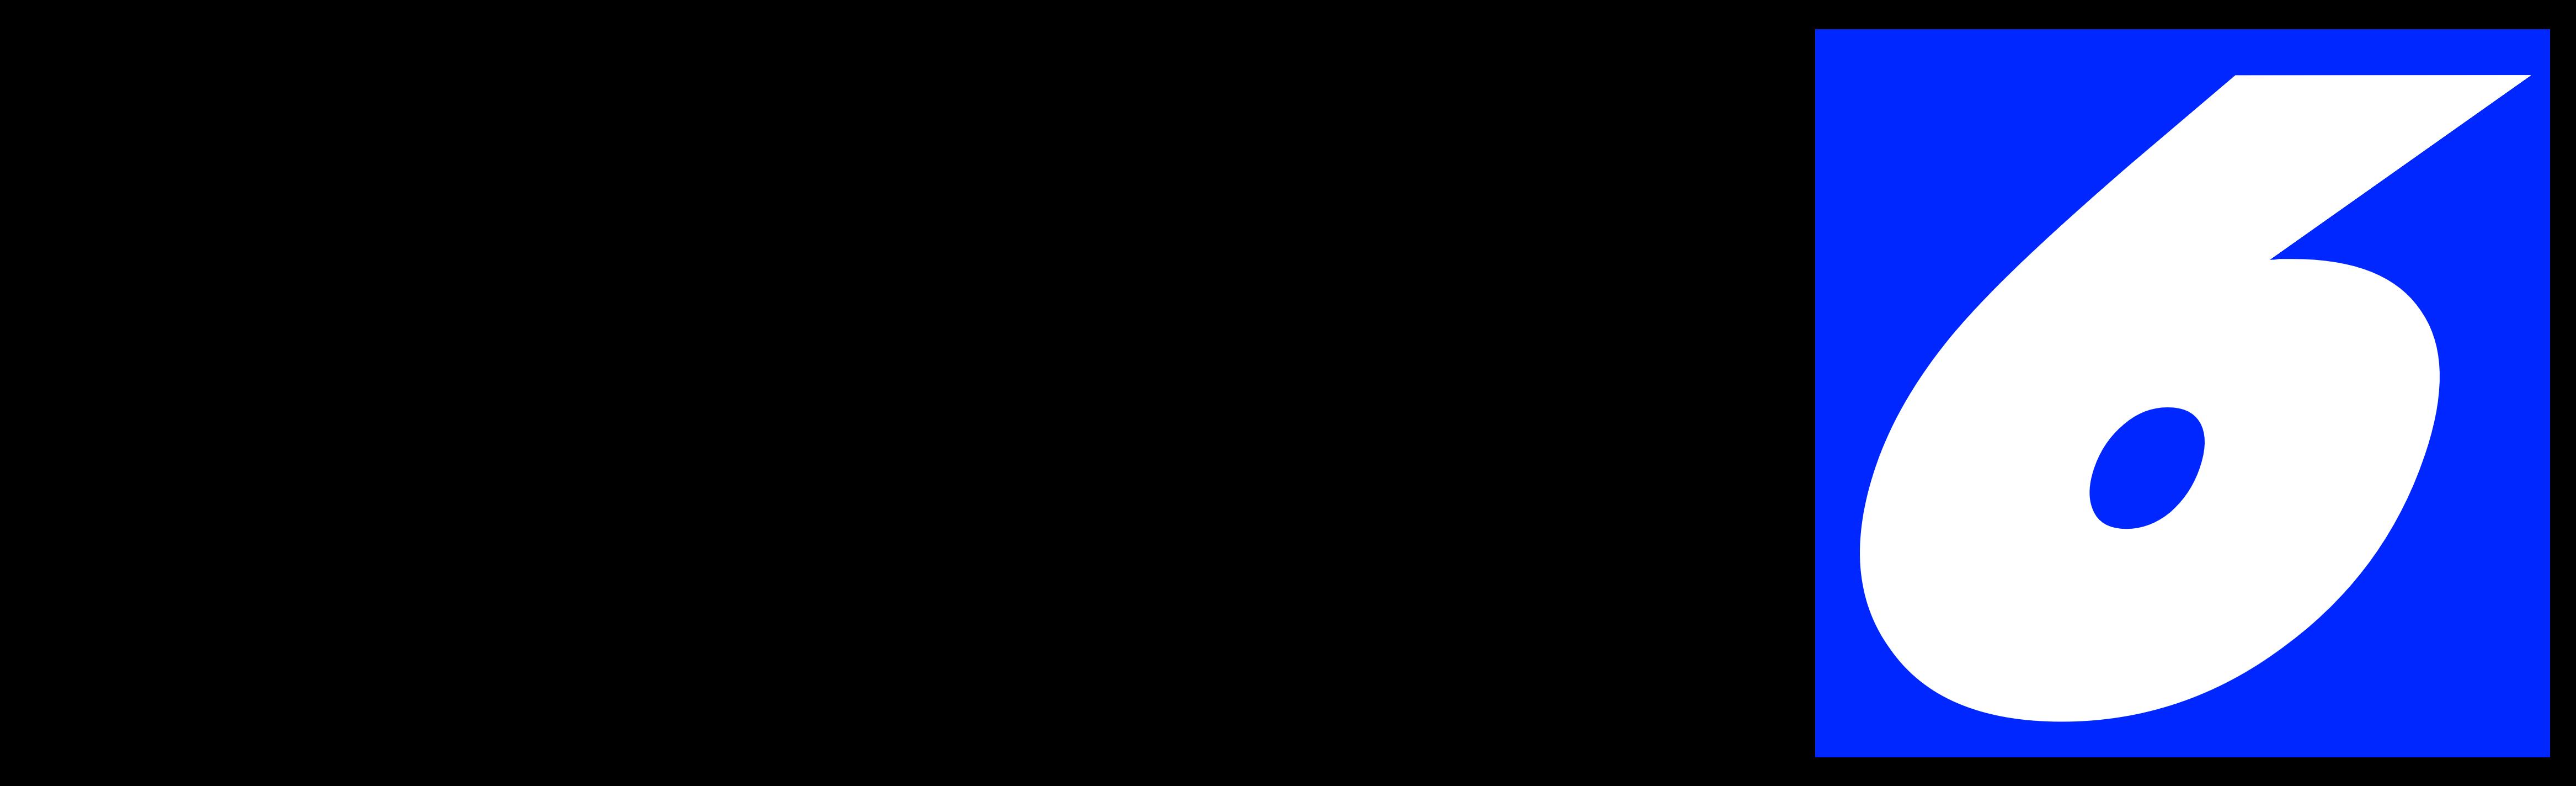 AlternateHistory.com's WATE logo #1.png